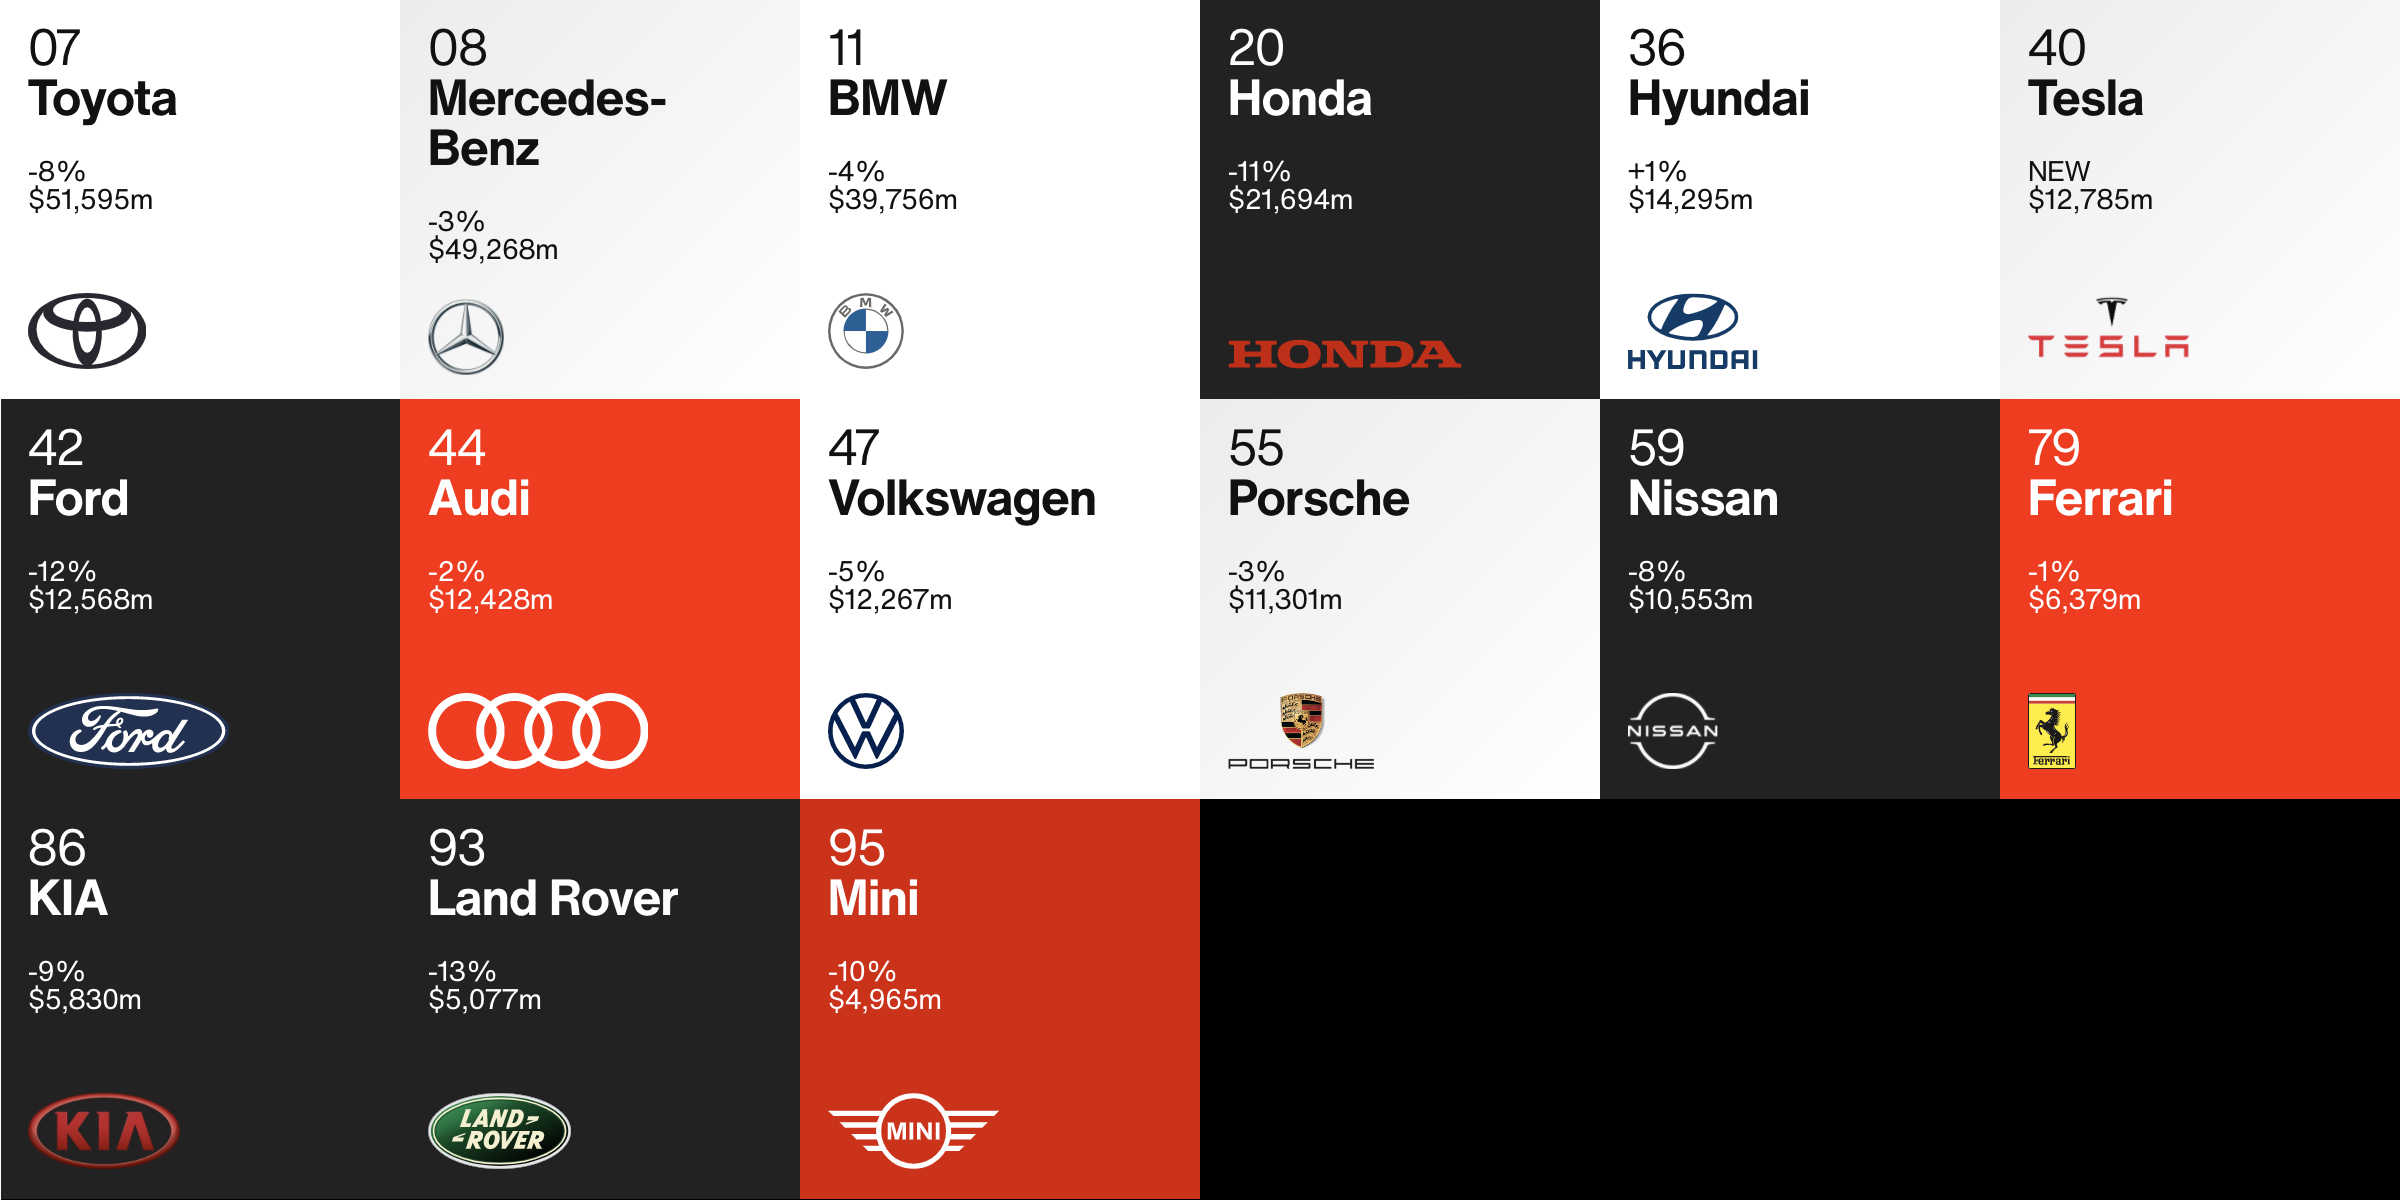 Classement automobile Interbrand 2020